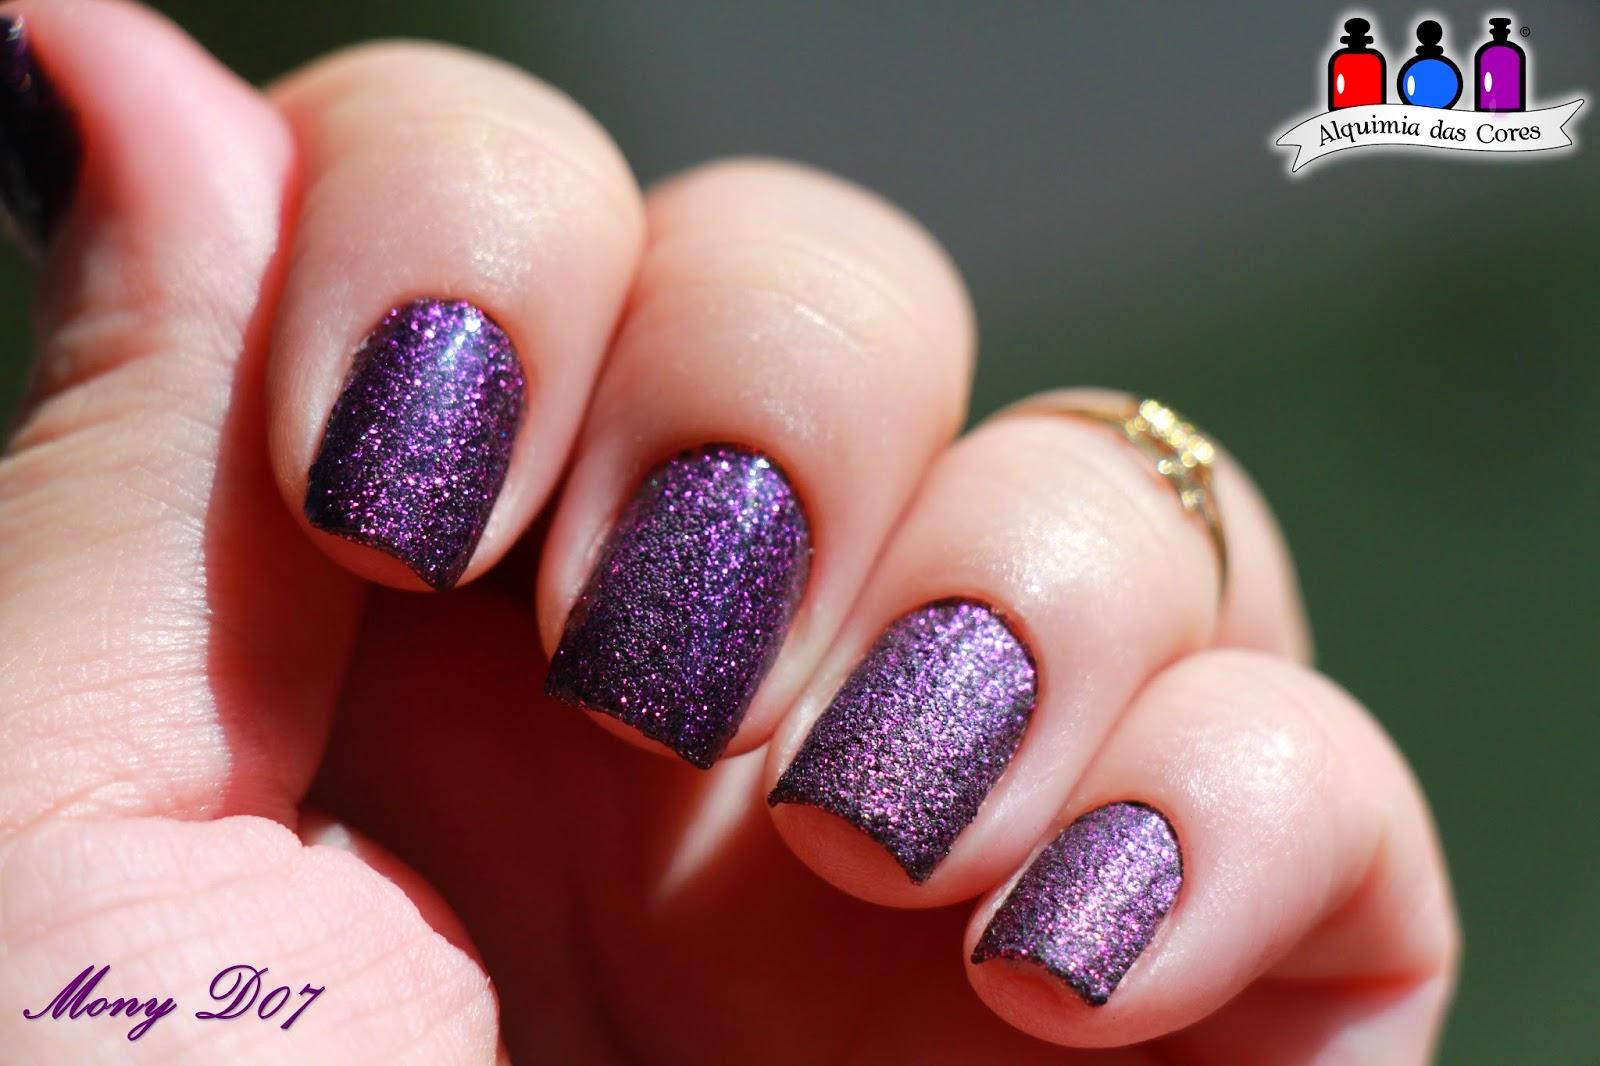 Milani, 524 Purple Gleam, roxo, glitter, Liquid Sand, Simone D07, Simoned07, Mony D07, MonyD07, Magenta